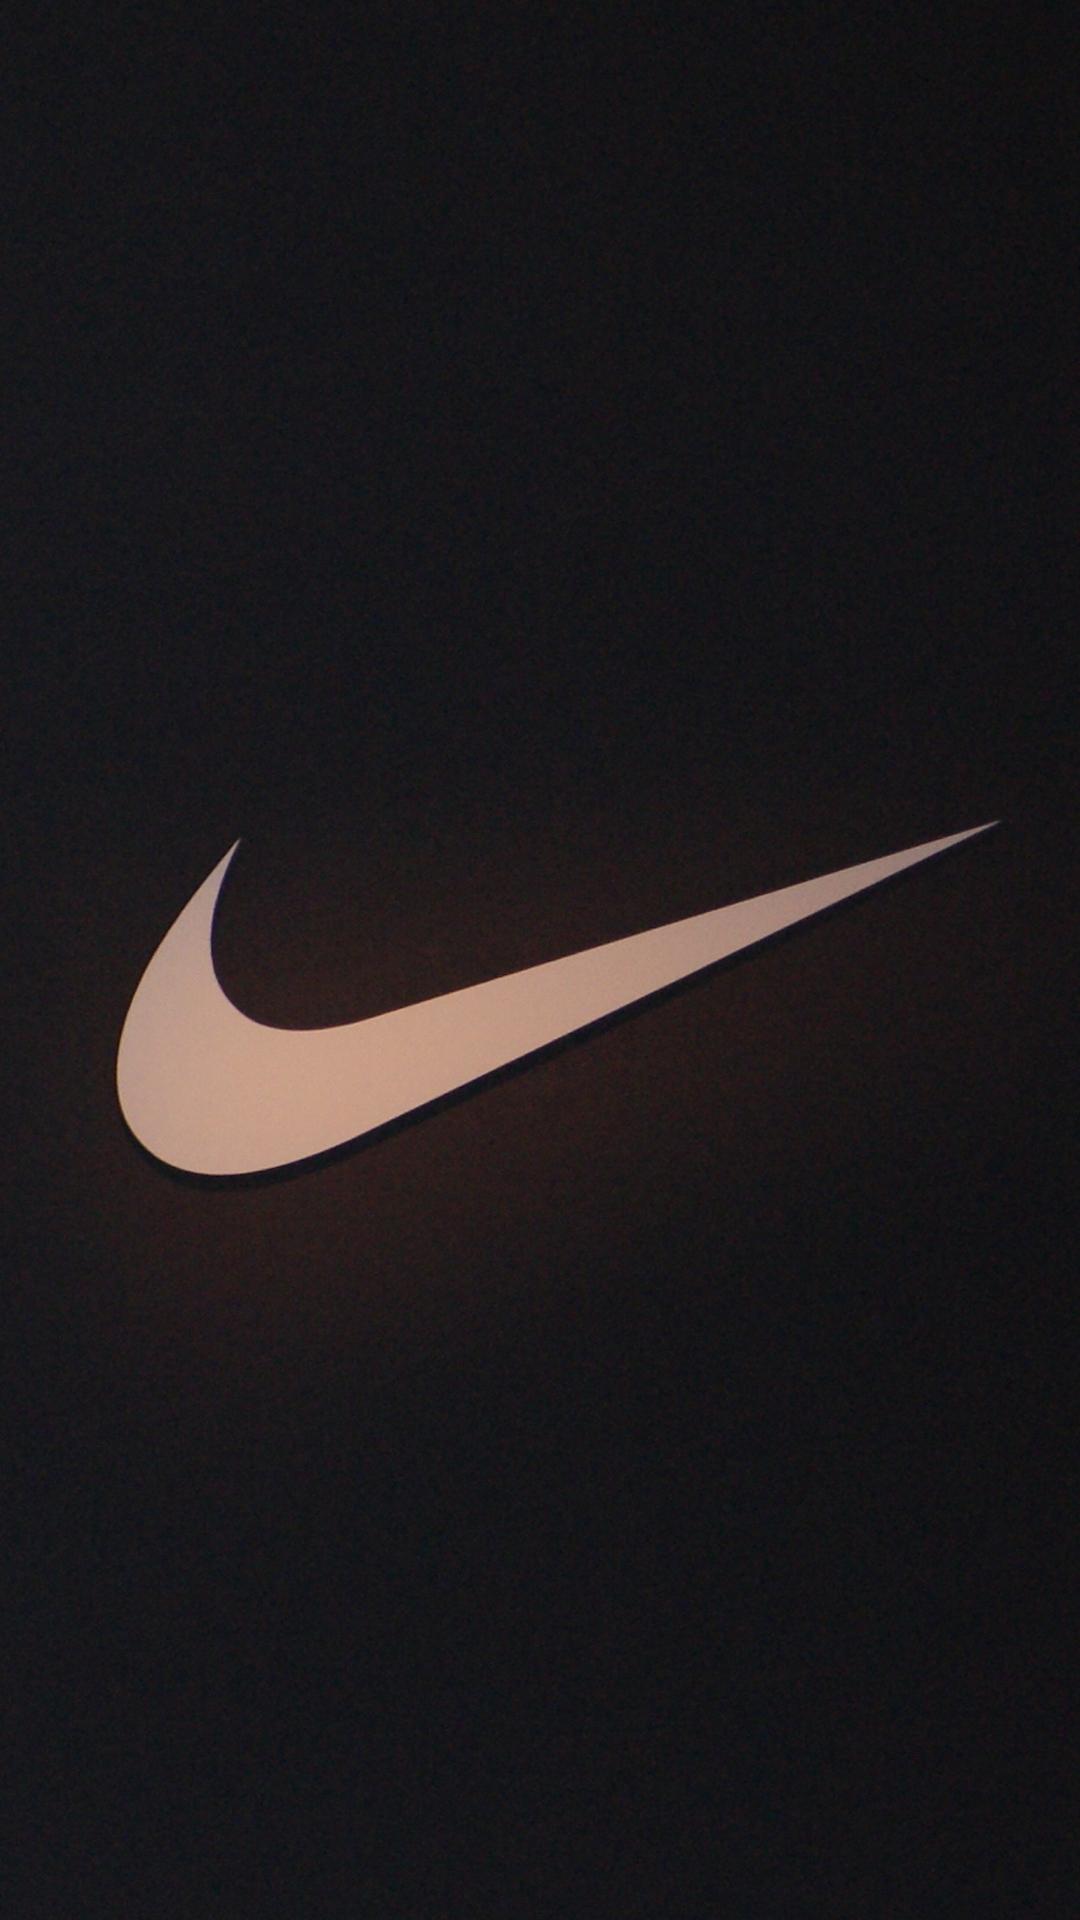 Nike Logo htc one wallpaper   Best htc one wallpapers 1080x1920